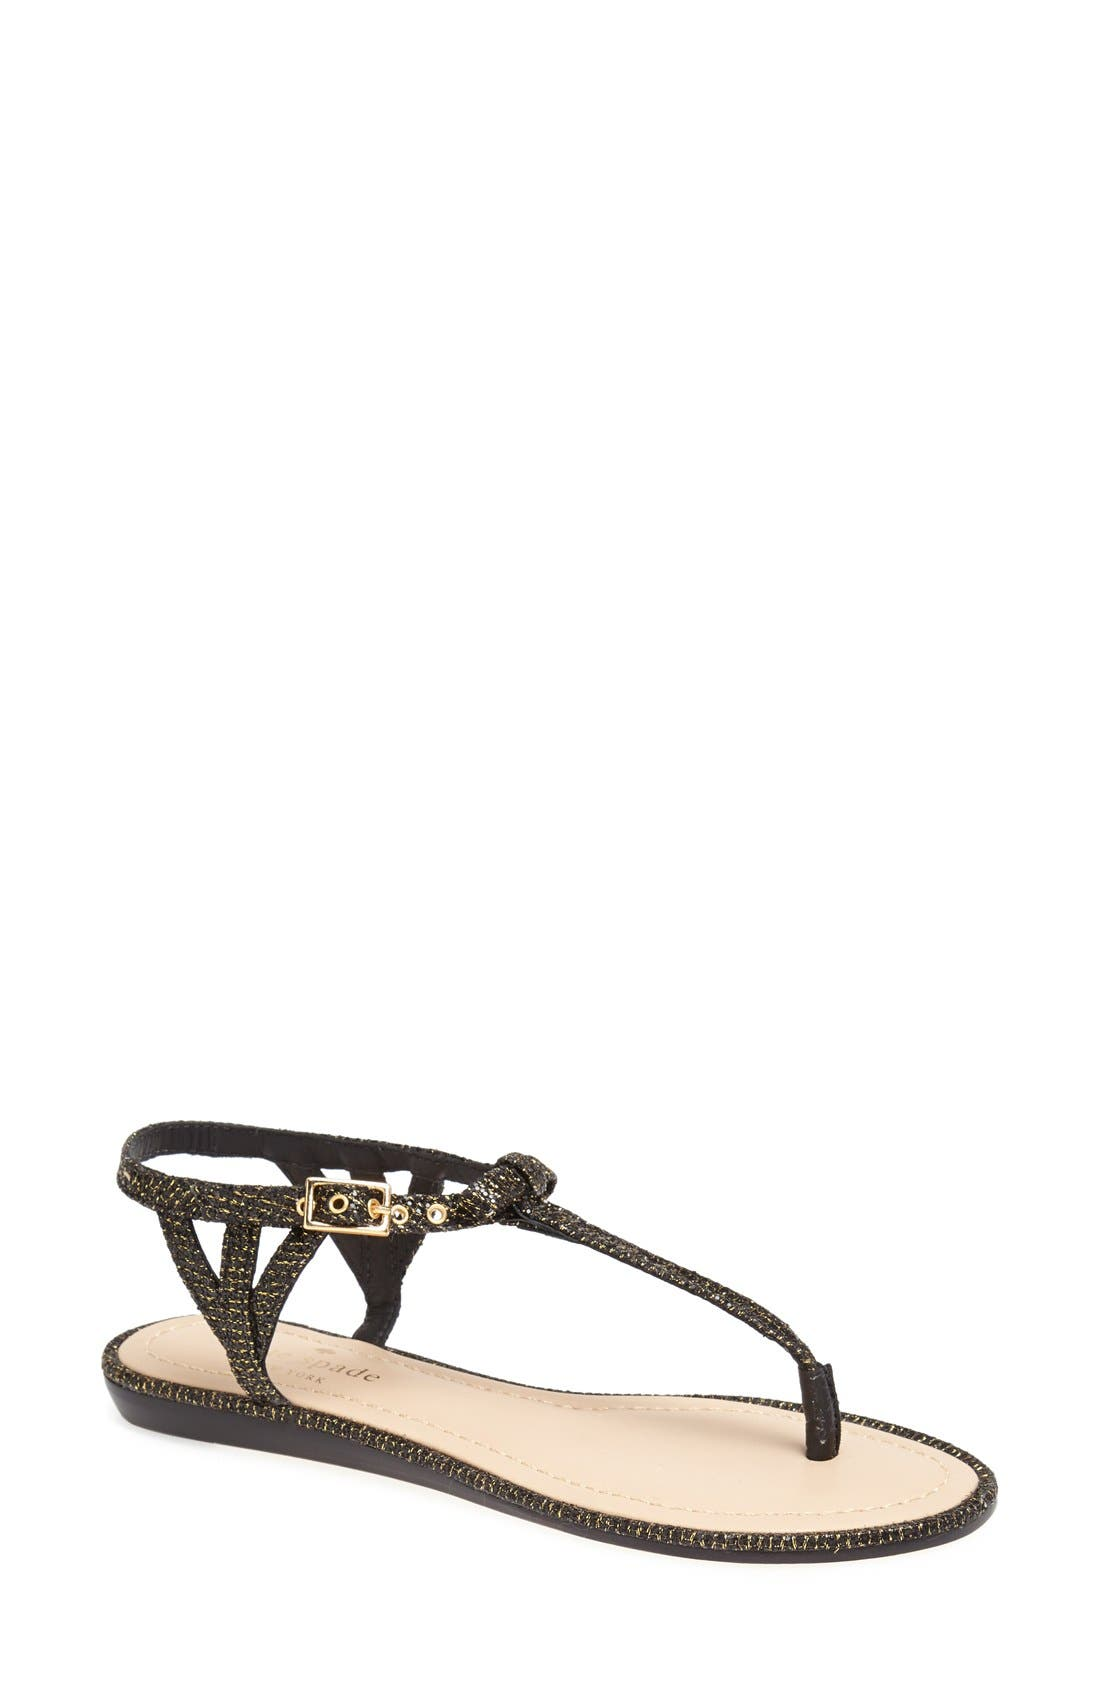 Alternate Image 1 Selected - kate spade new york 'andrea' flat thong sandal